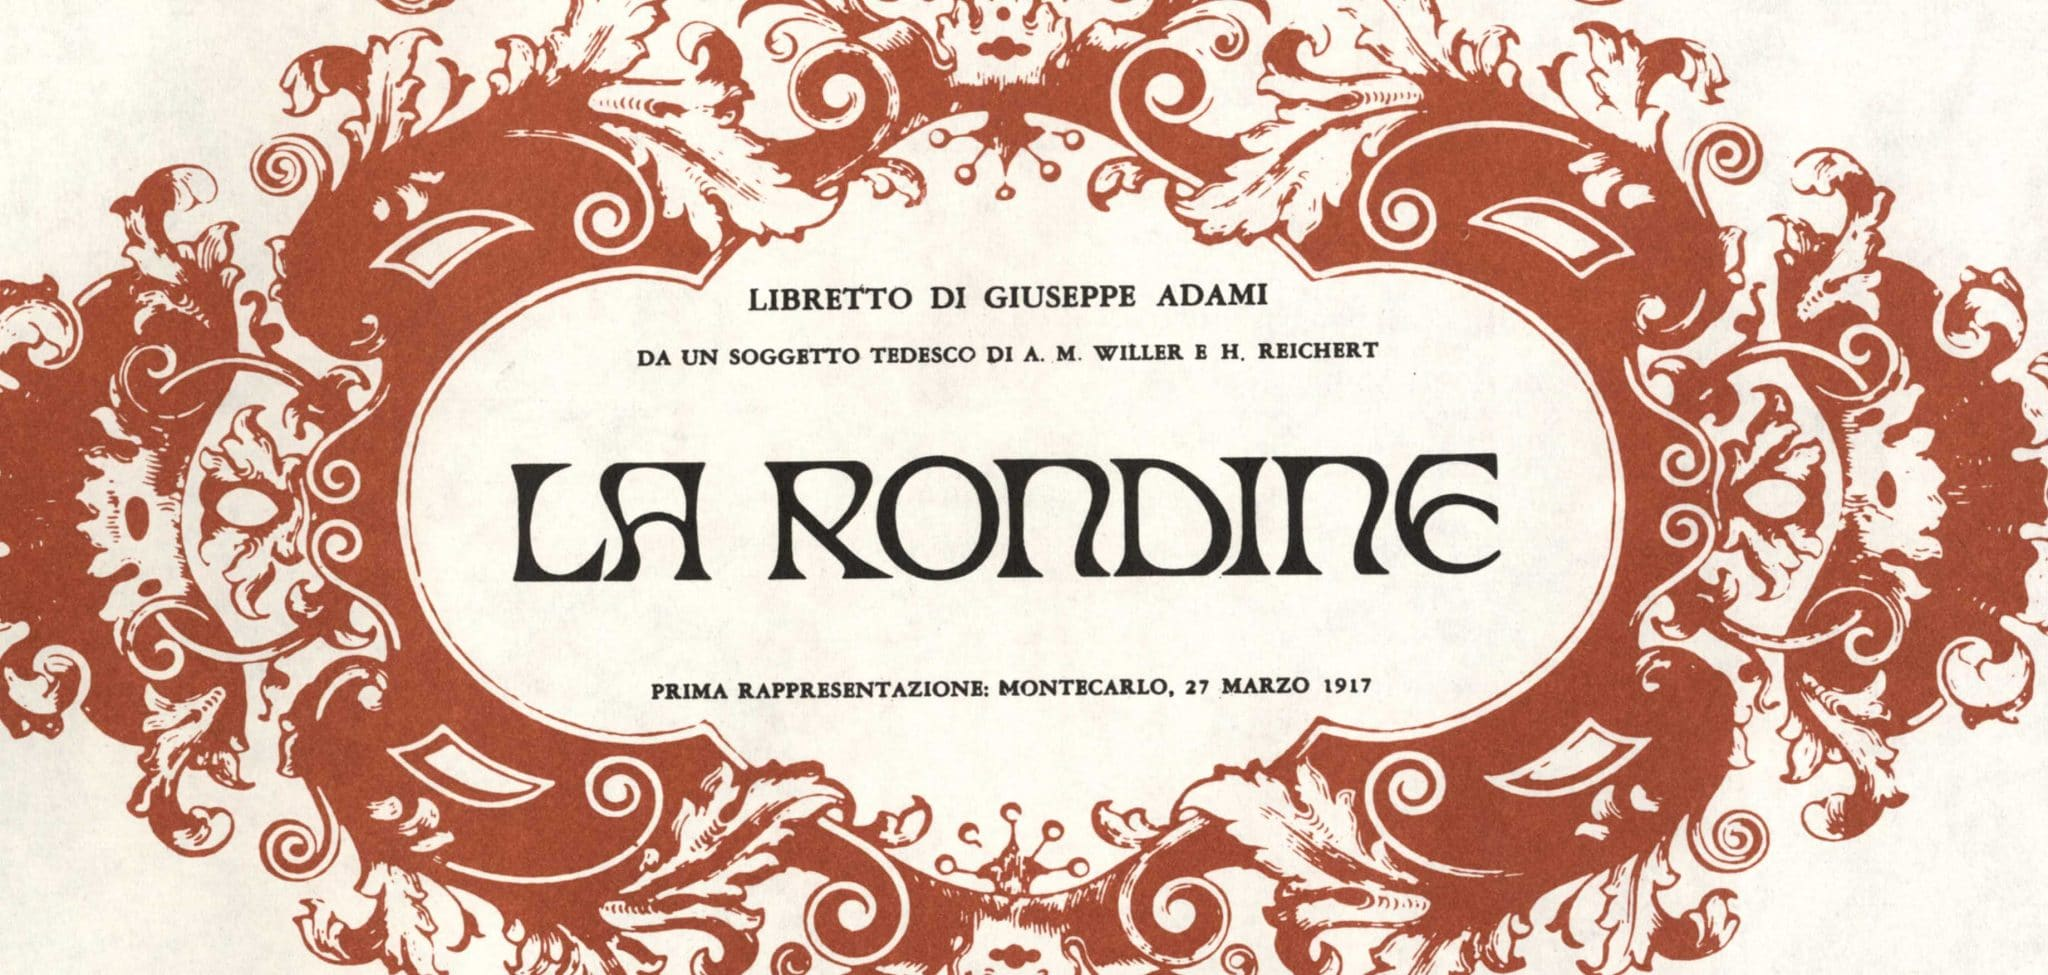 1917-18 Teatro Costanzi